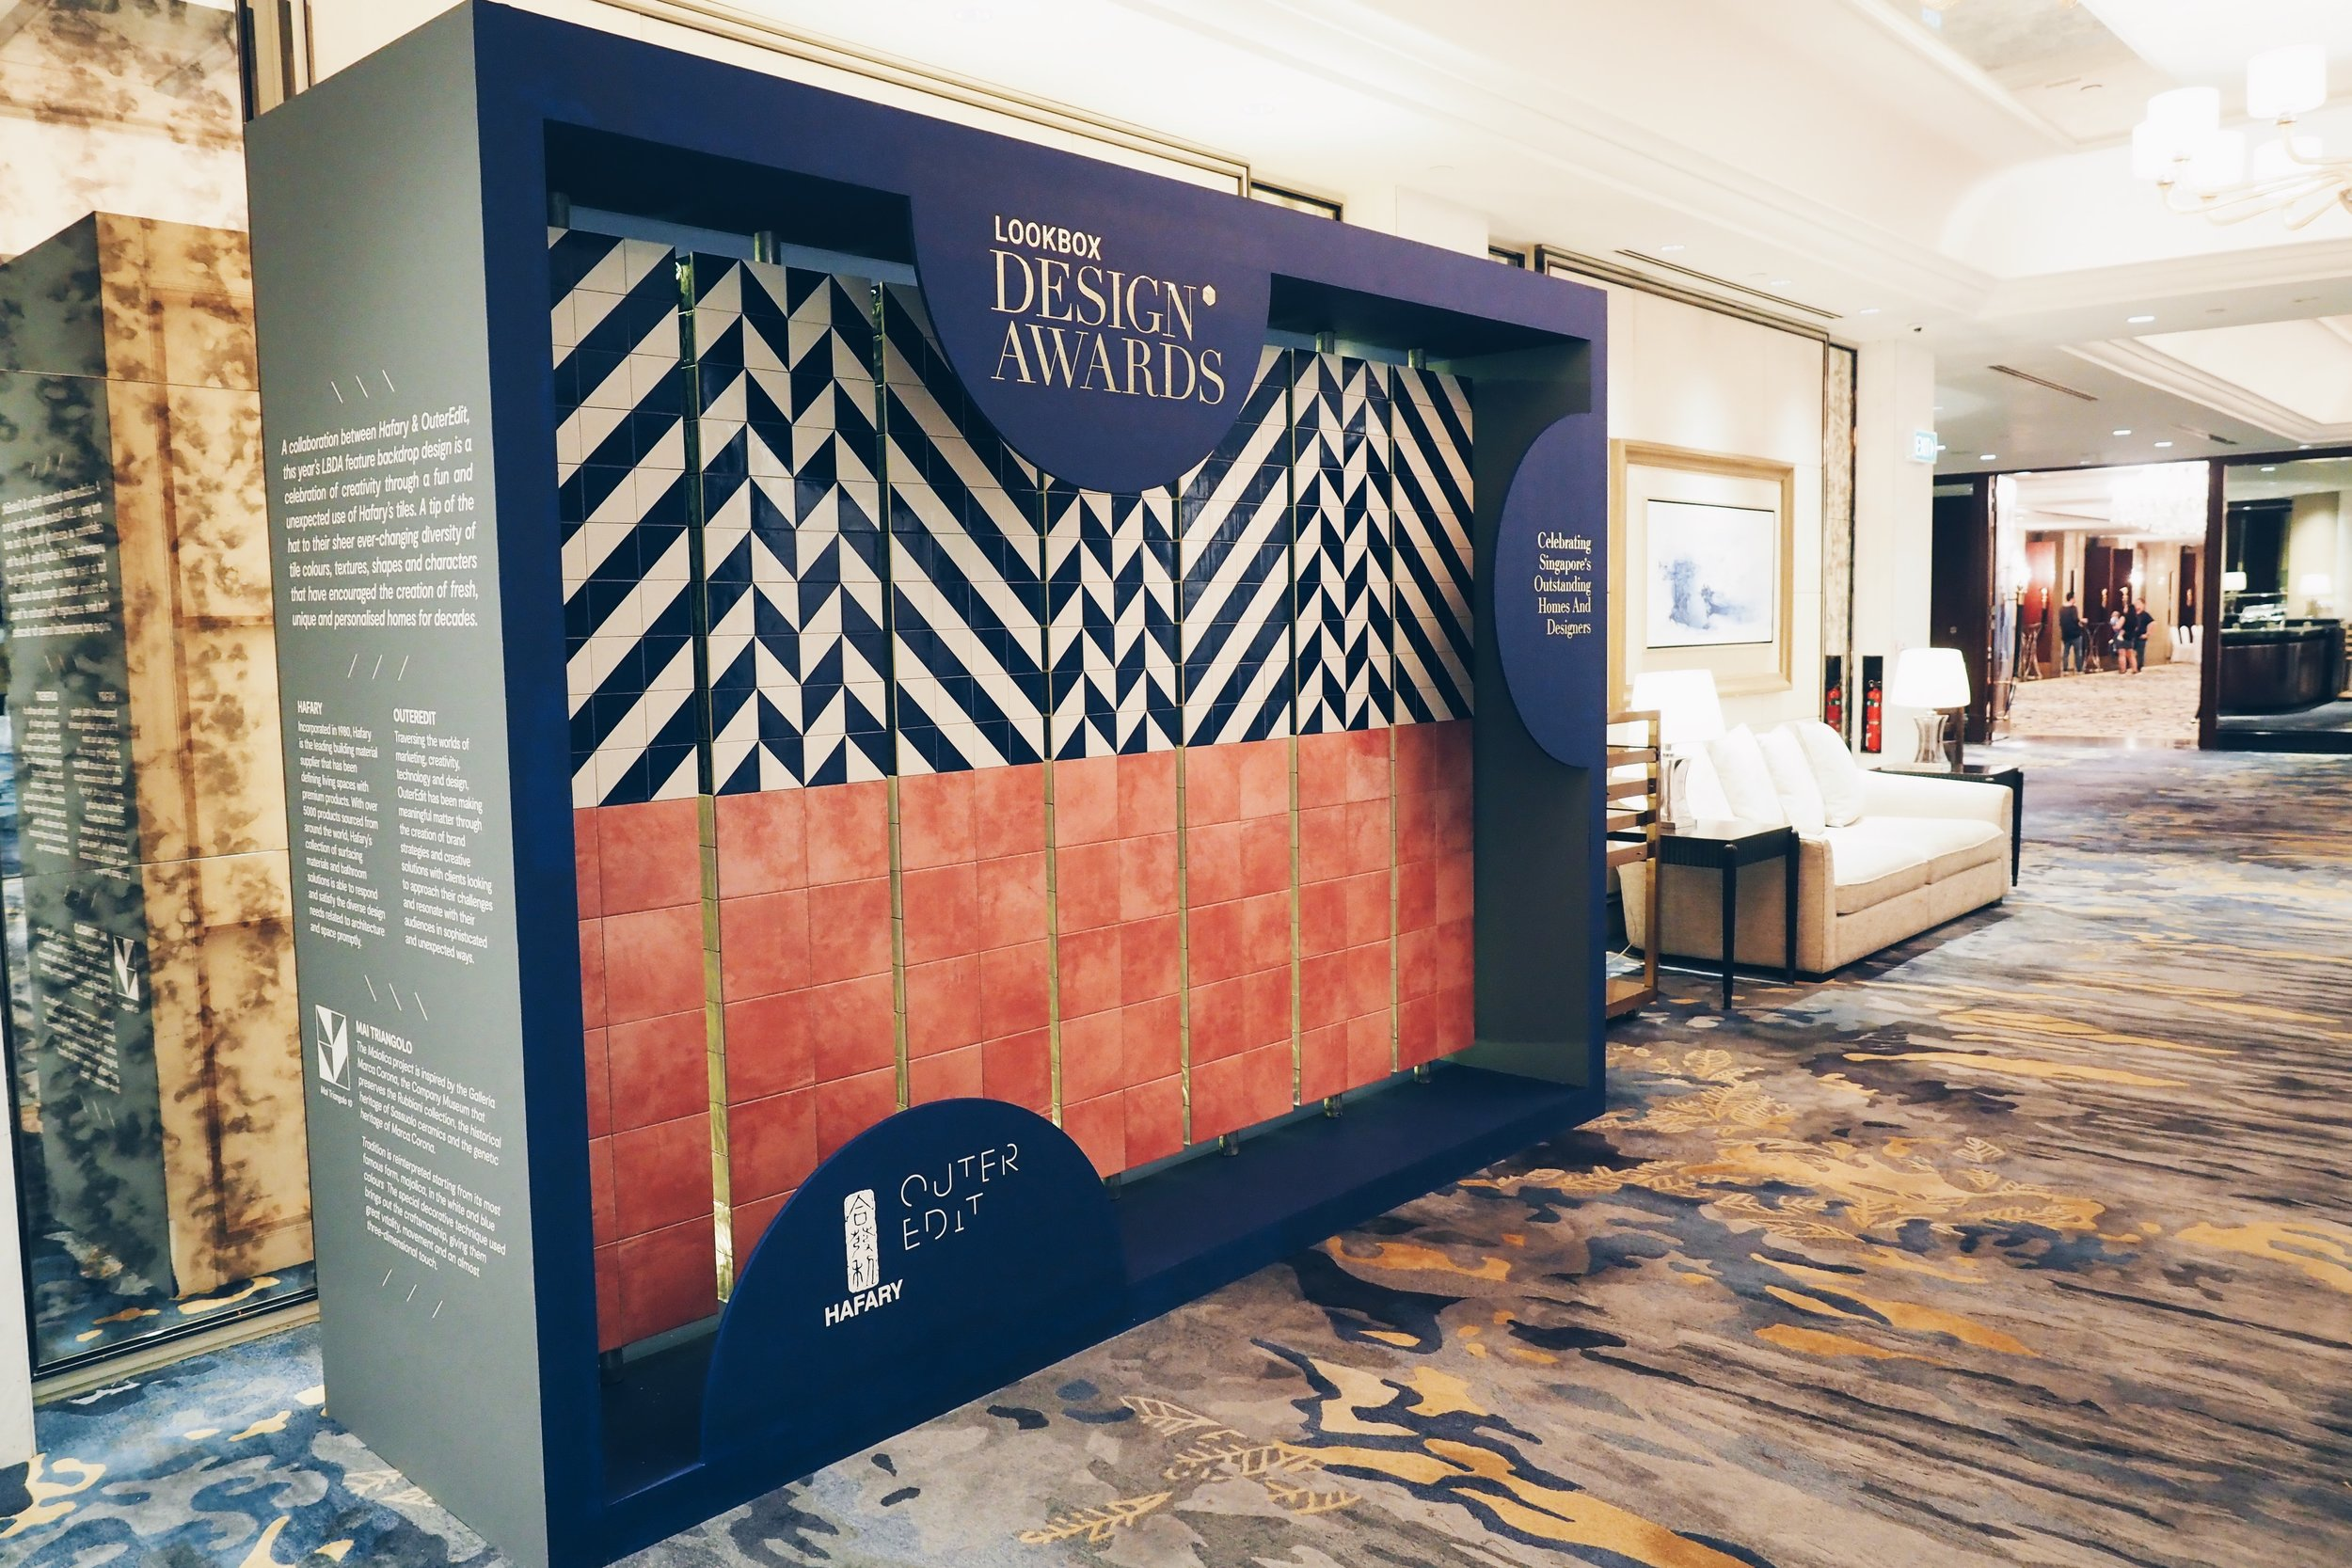 Lookbox Design Awards x OuterEdit - Final Backdrop